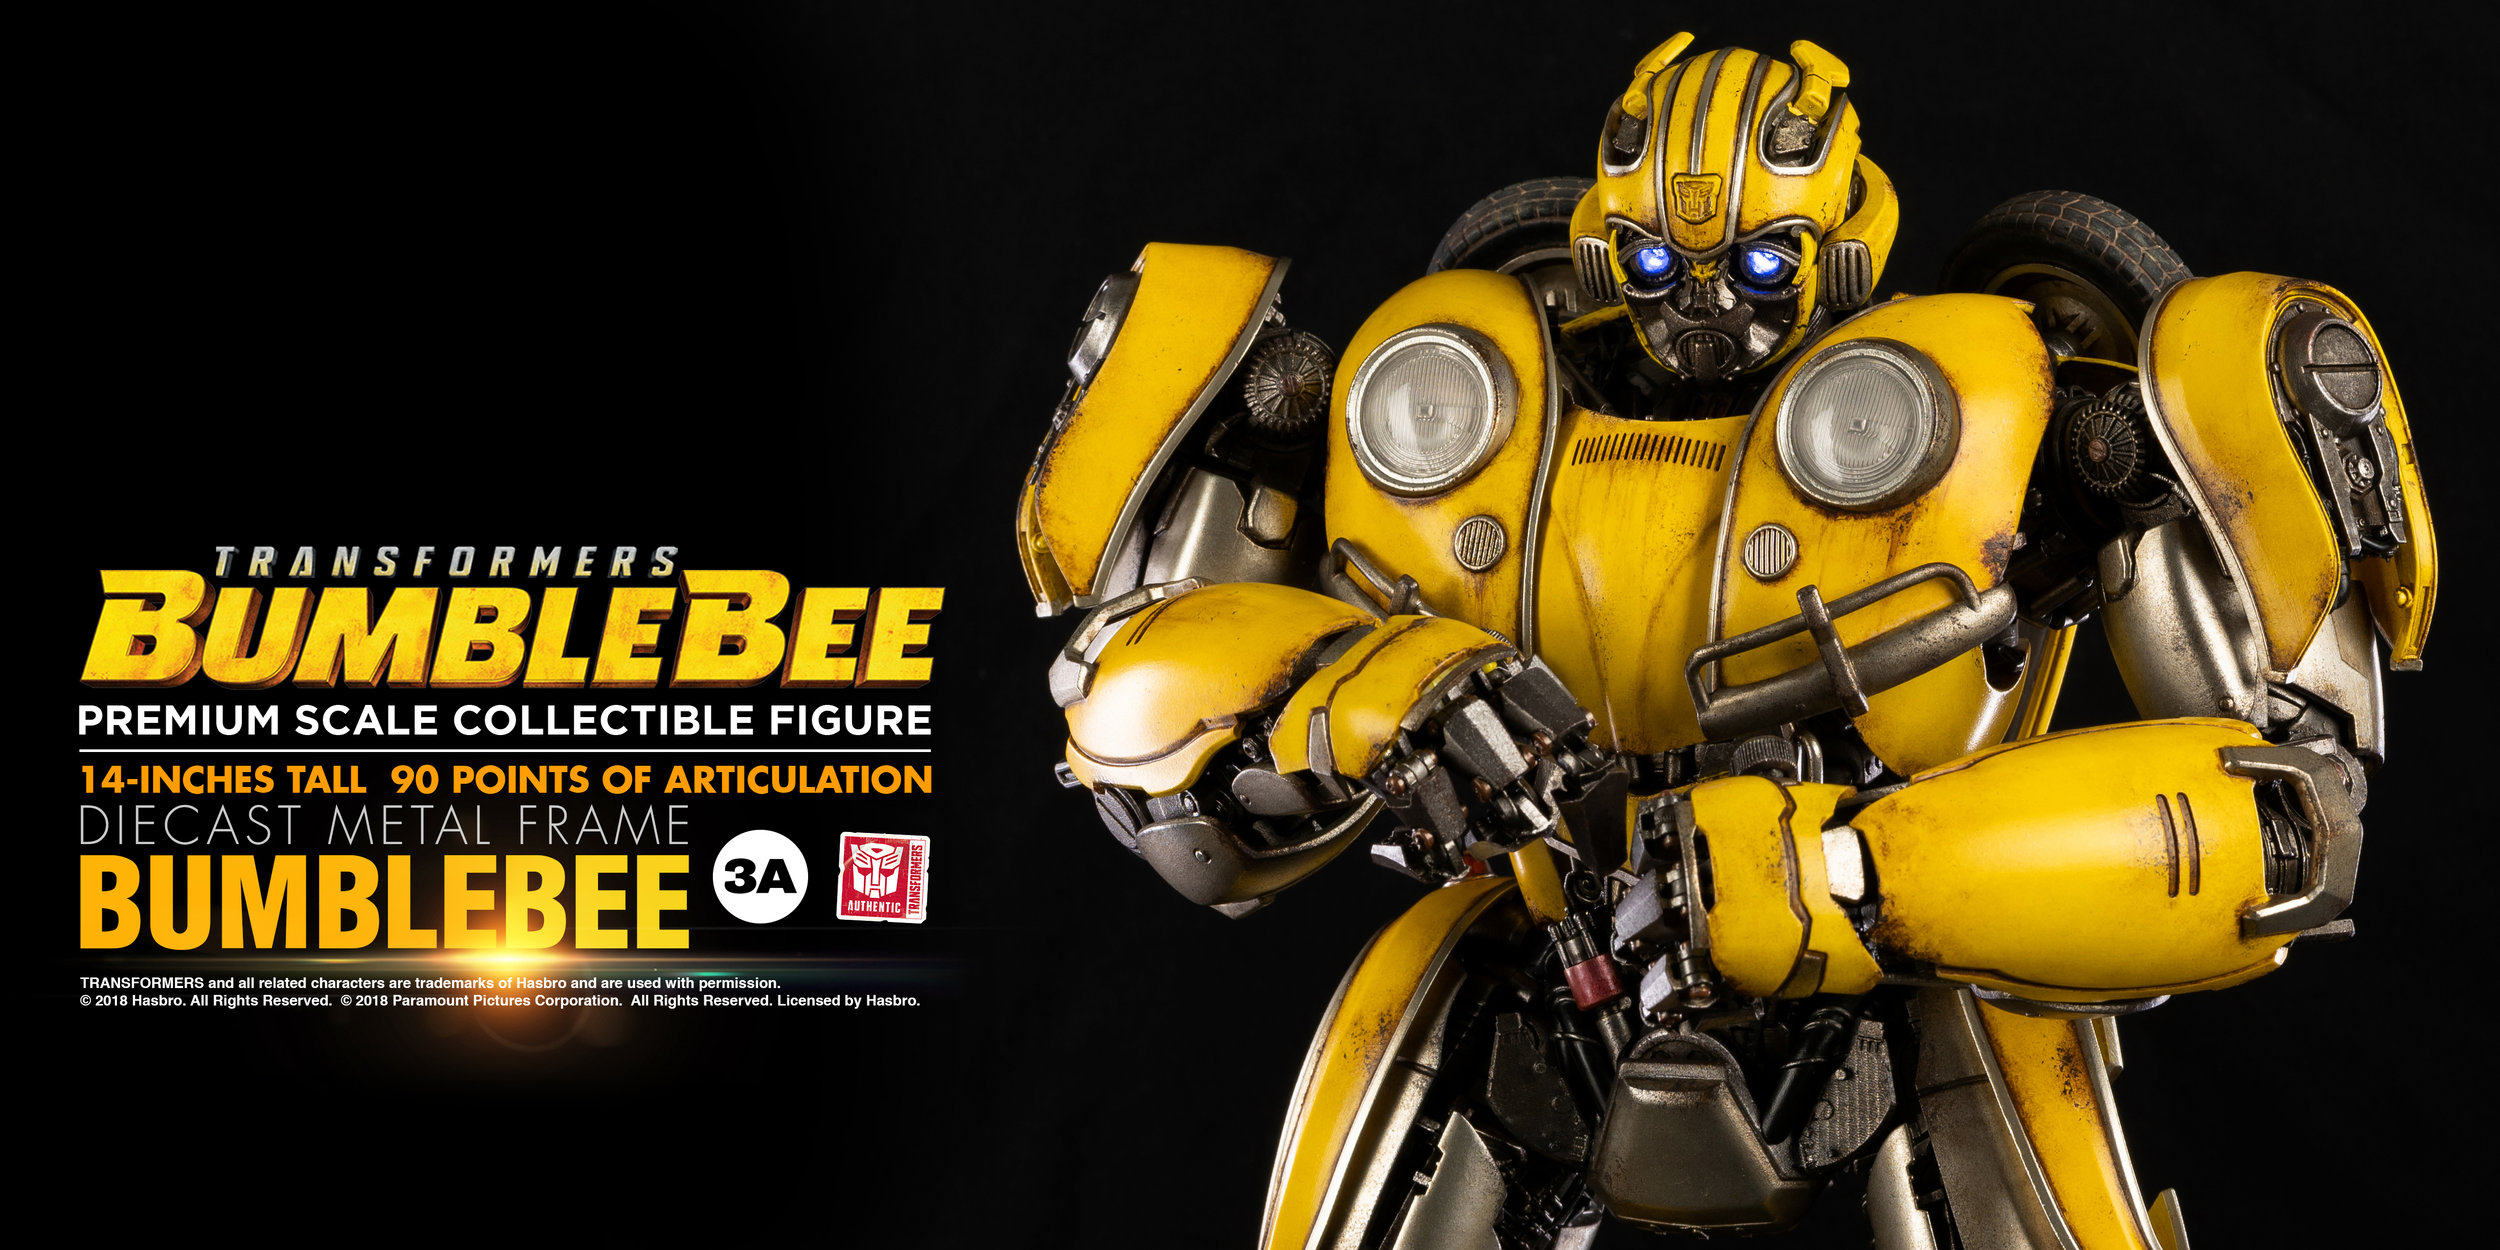 Bumblebee_ENG_PM_WIDE_003.jpg